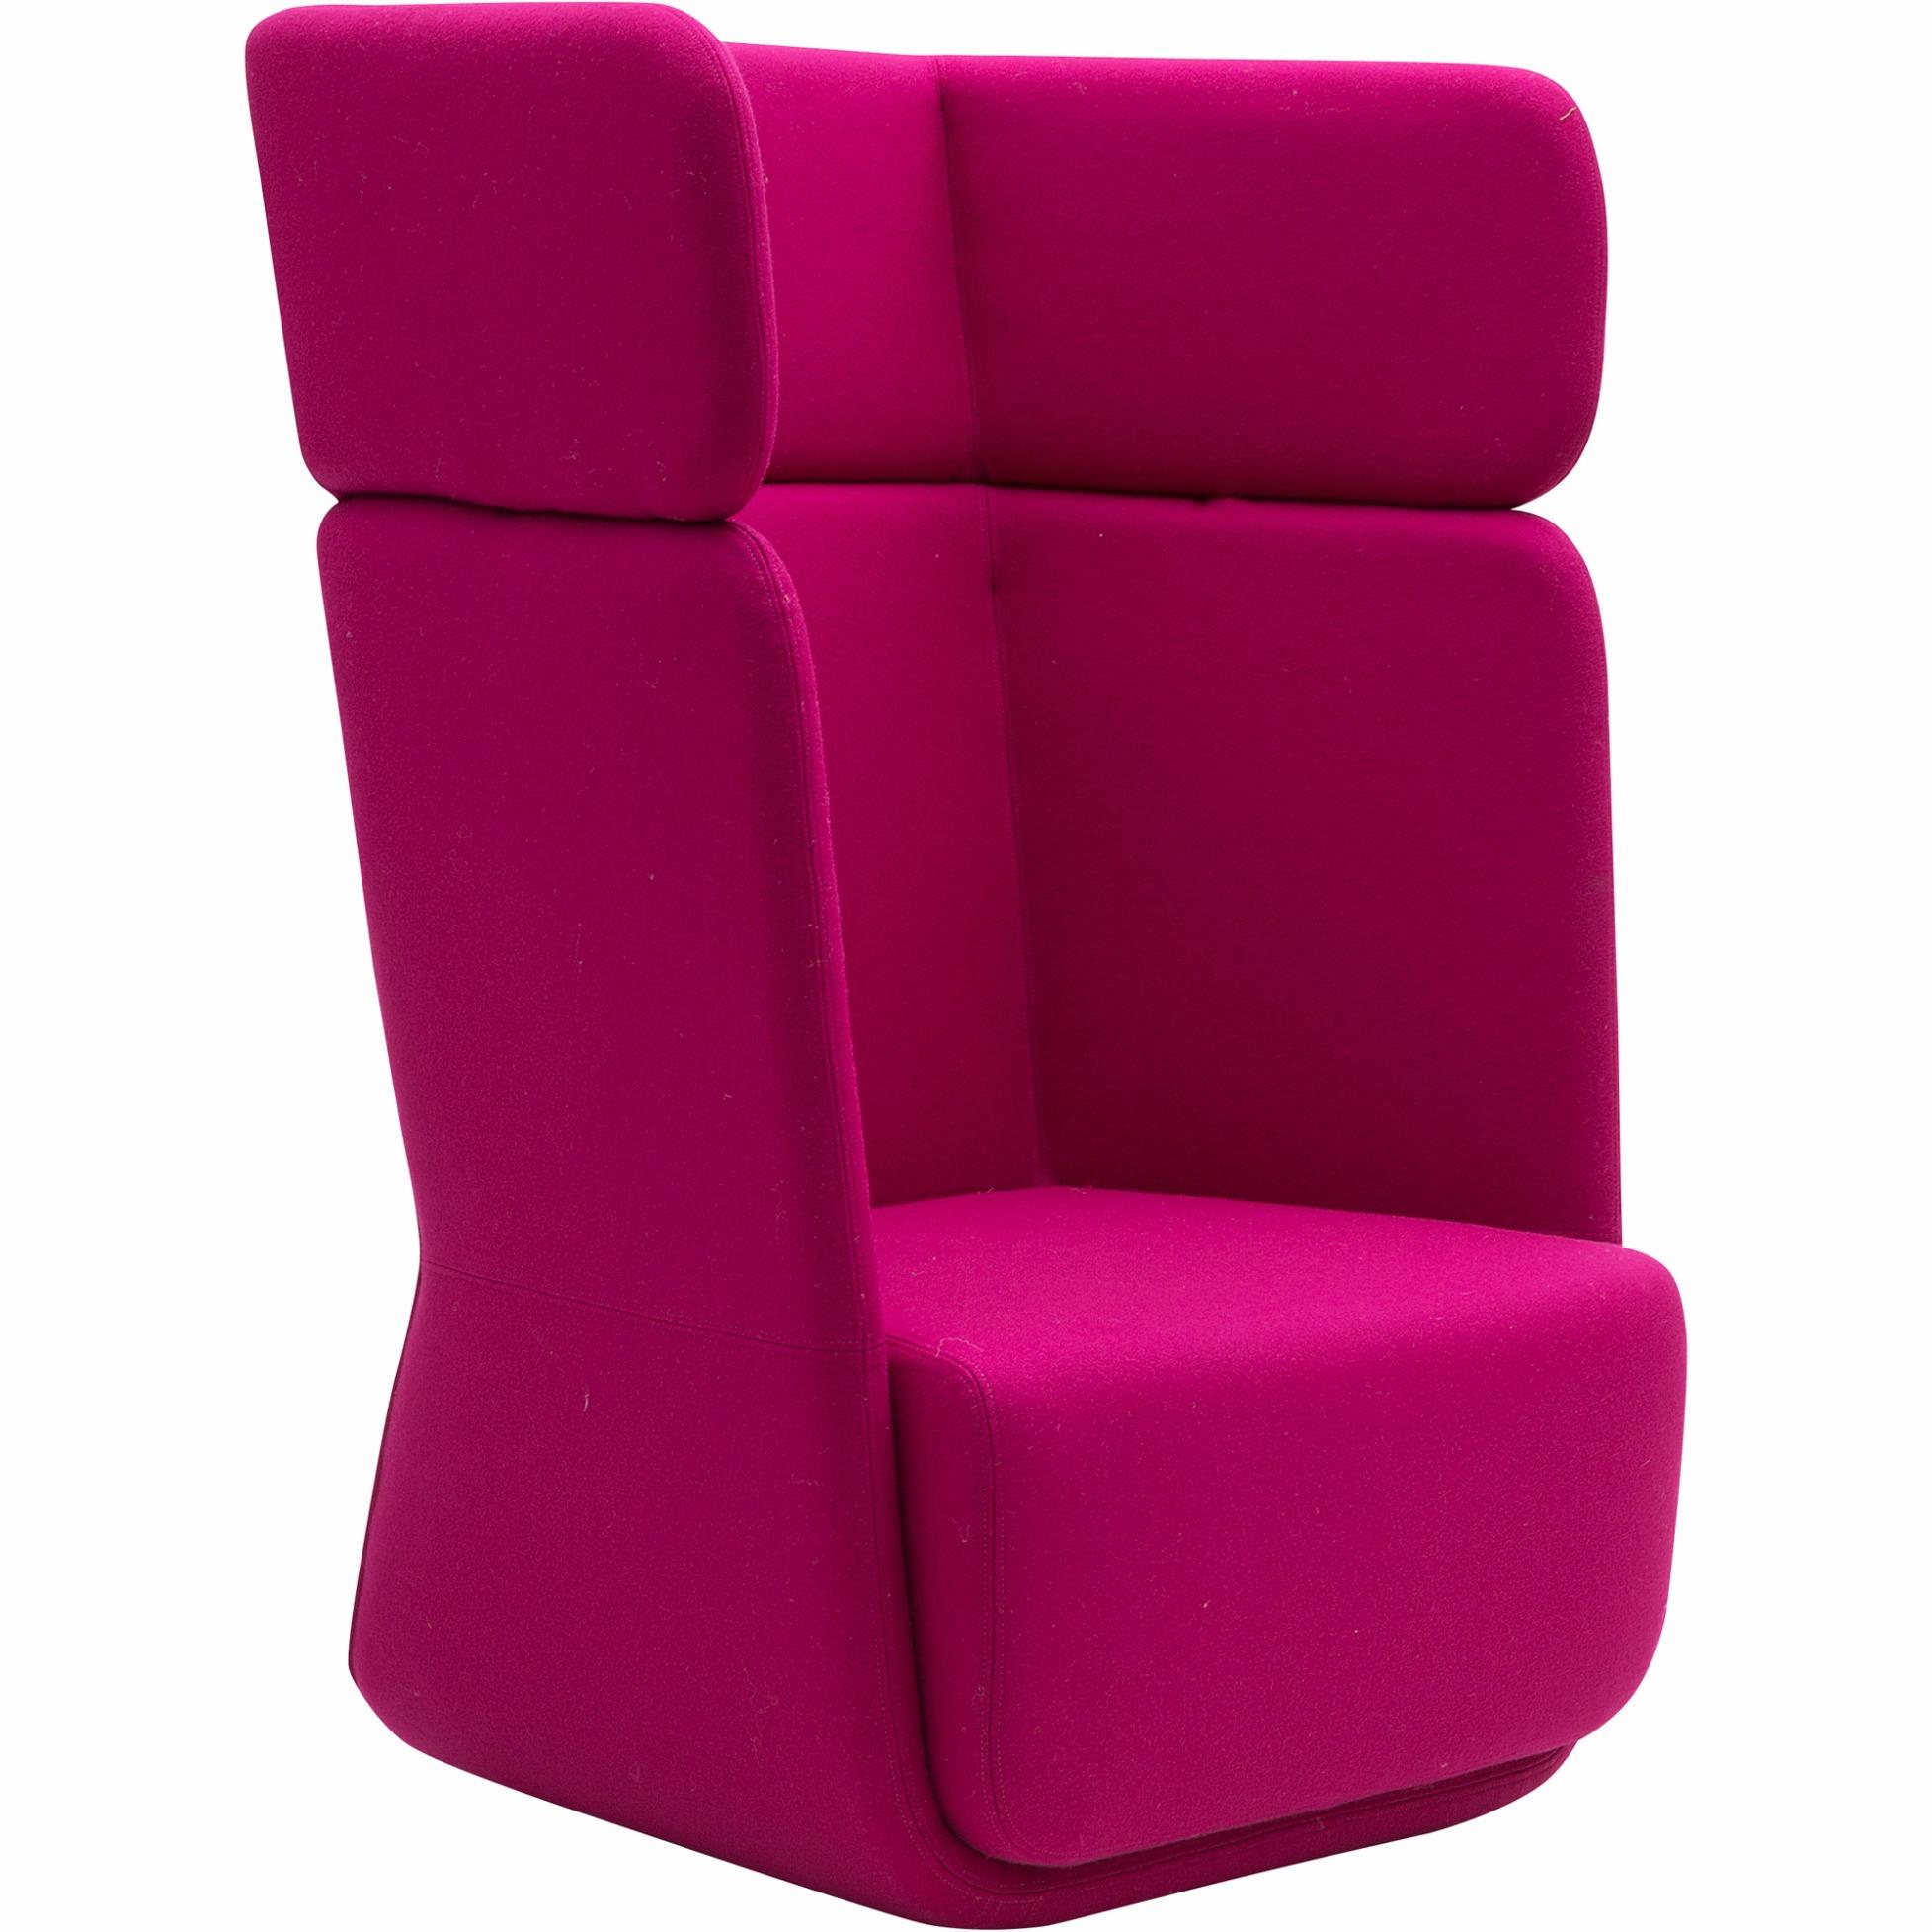 Sessel basket hoch von softline for Sessel schmal hoch